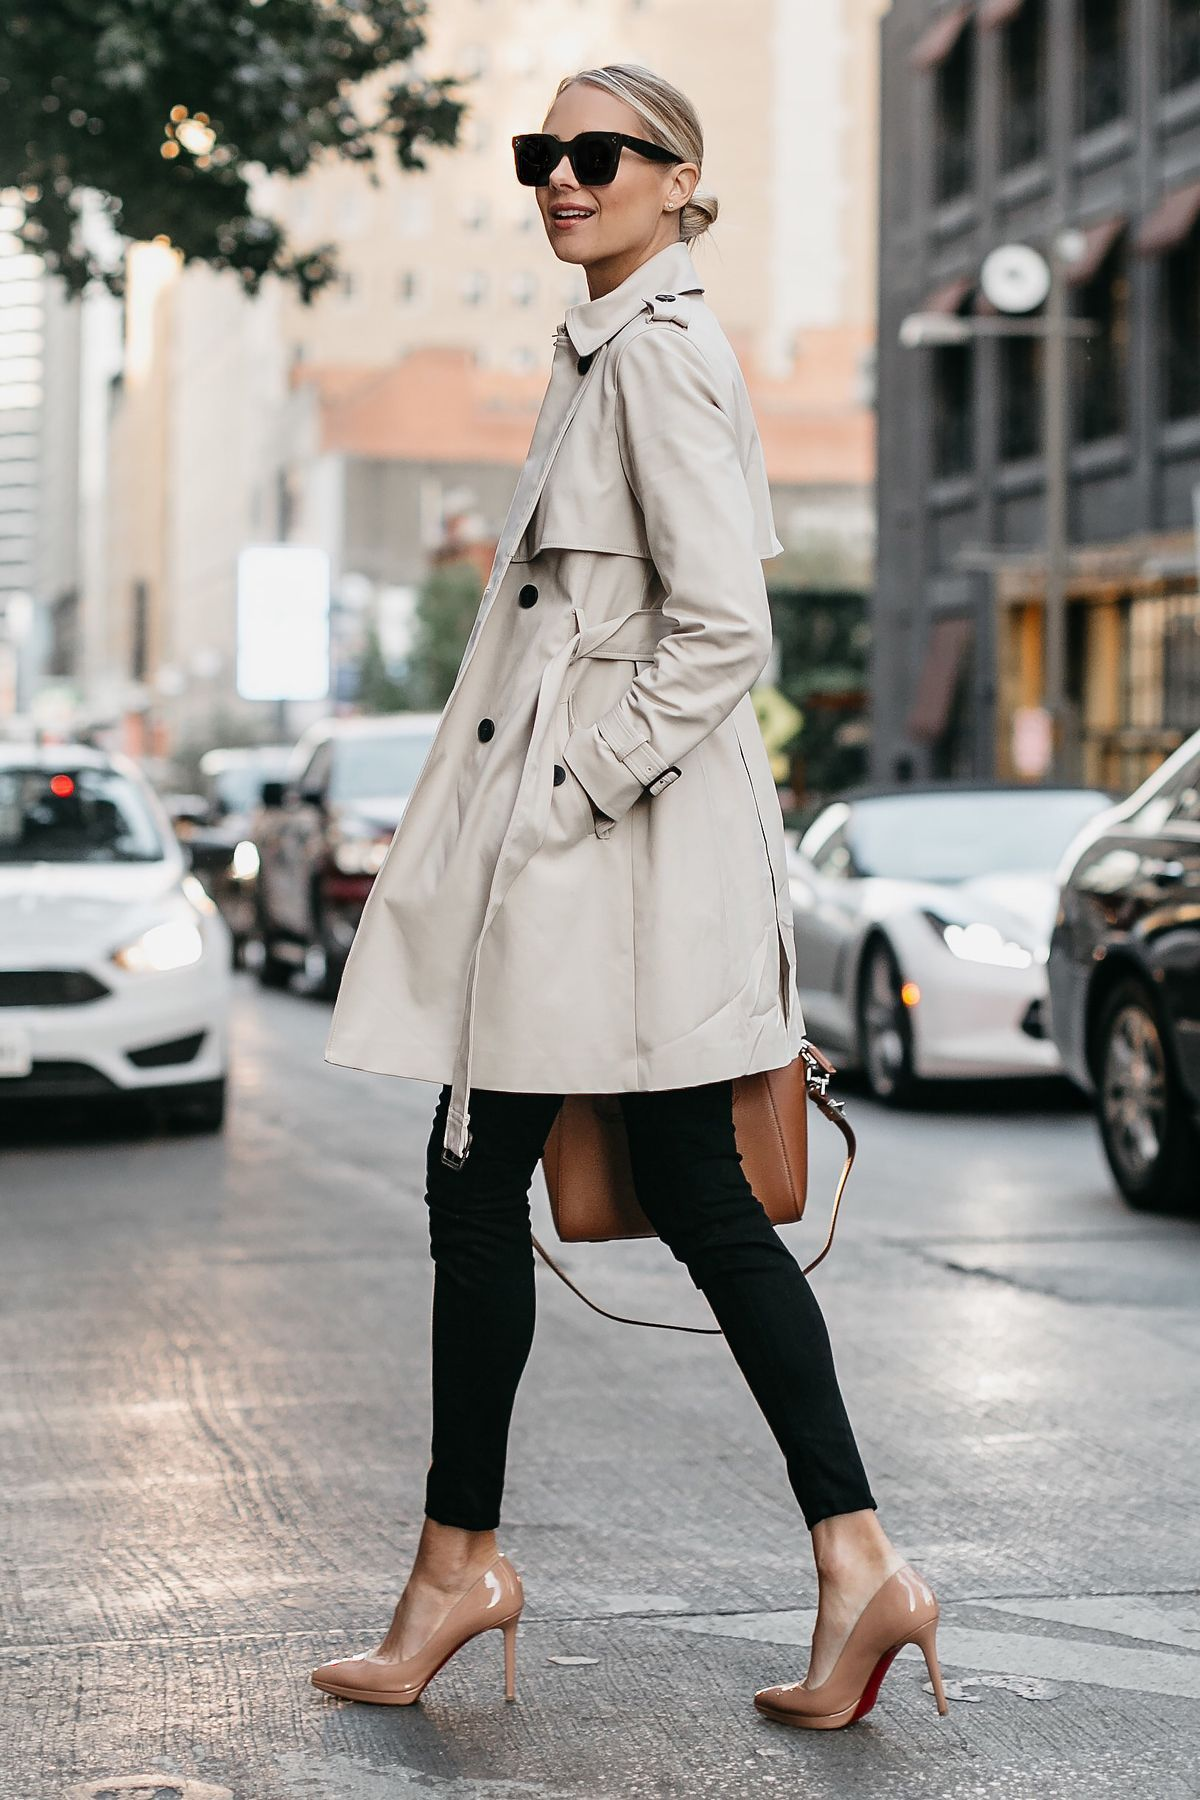 c812126c2ada Blonde Woman Wearing Club Monaco Trench Coat Black Sweater Black Skinny  Jeans Christian Louboutin Nude Pumps Fashion Jackson Dallas Blogger Fashion  Blogger ...